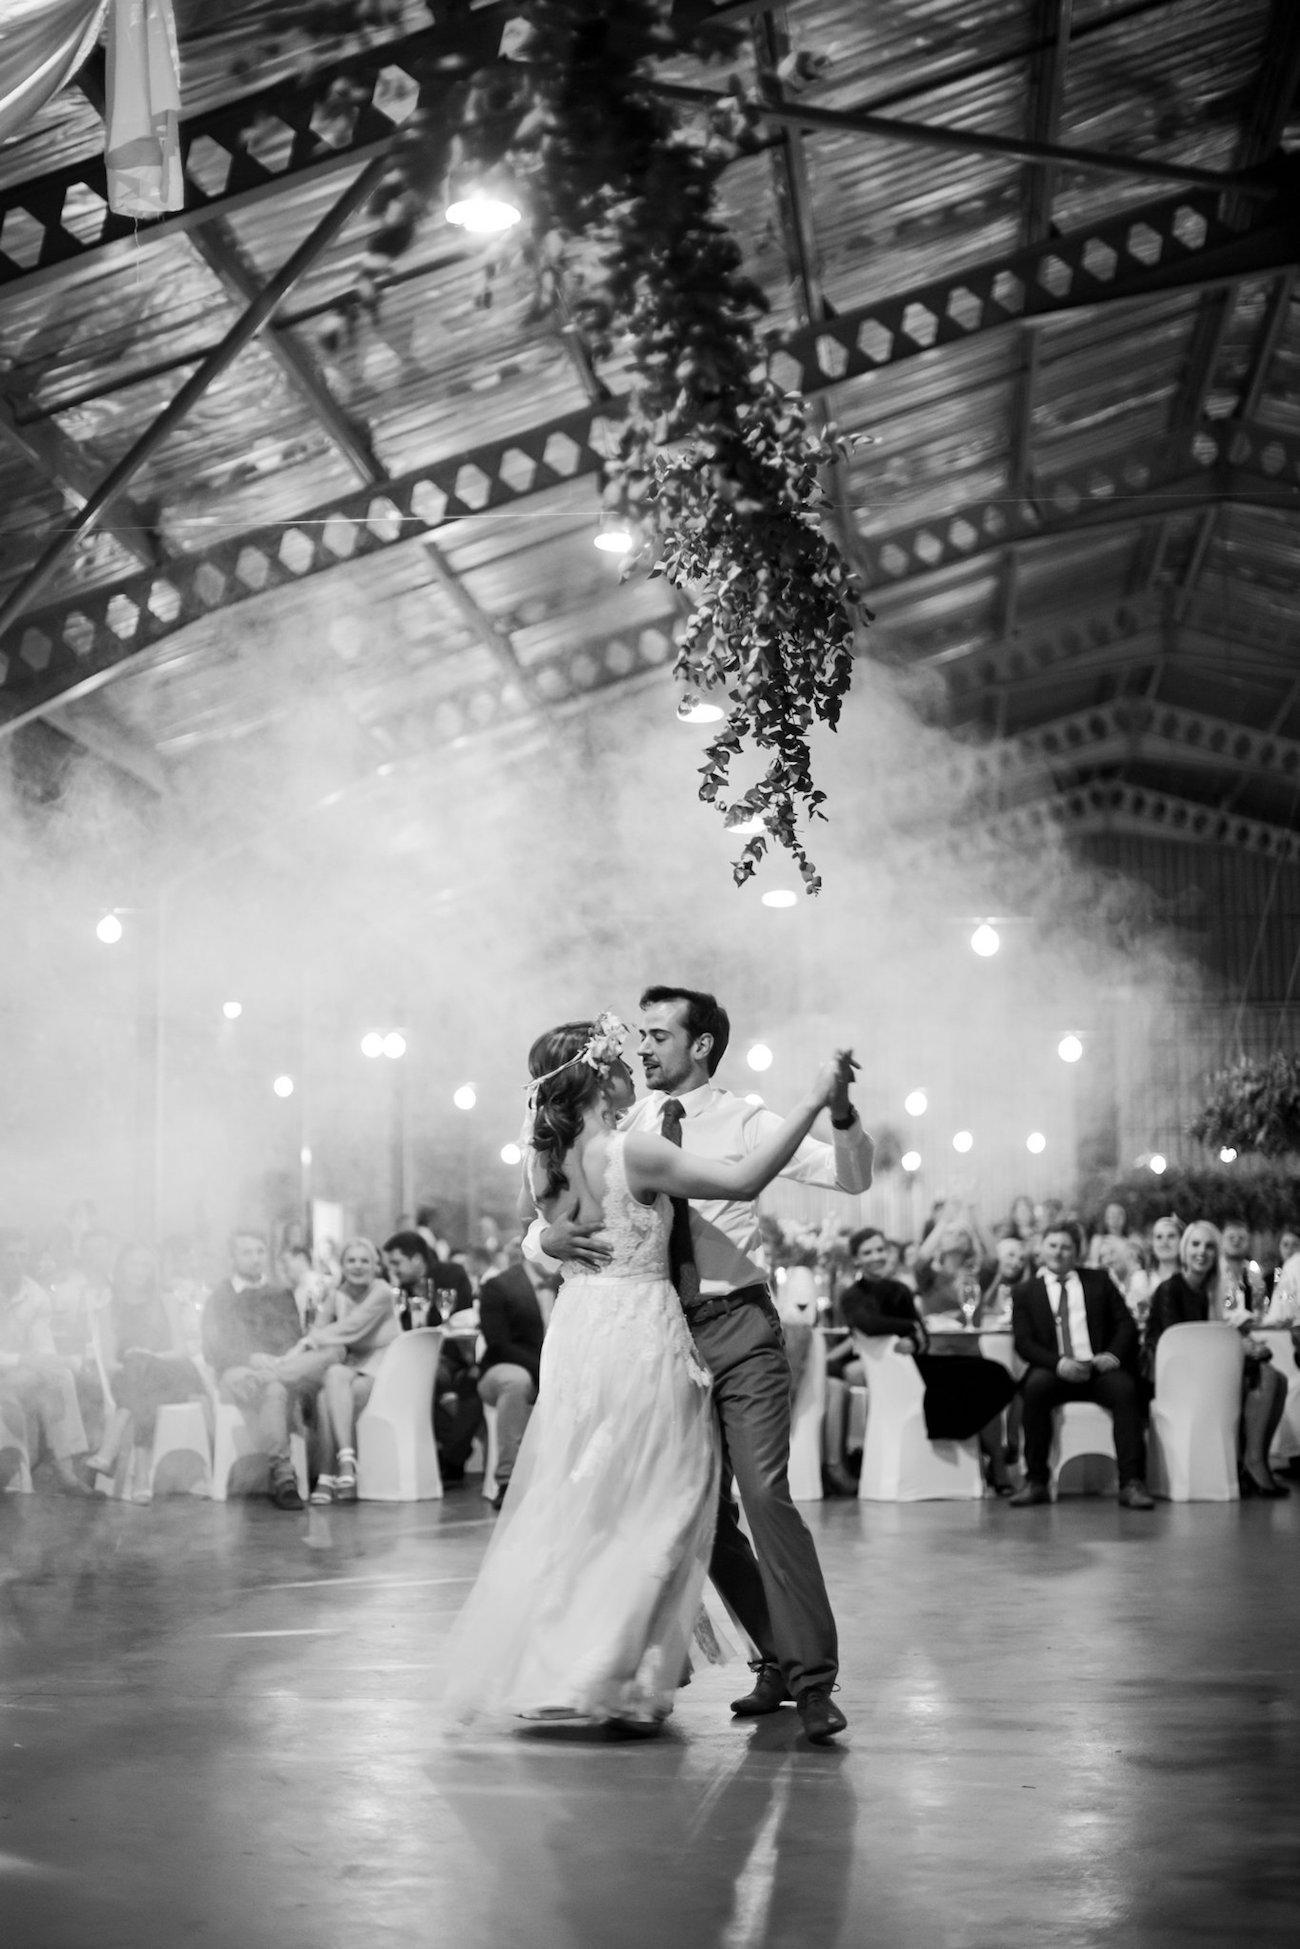 First Dance | Image: JCclick